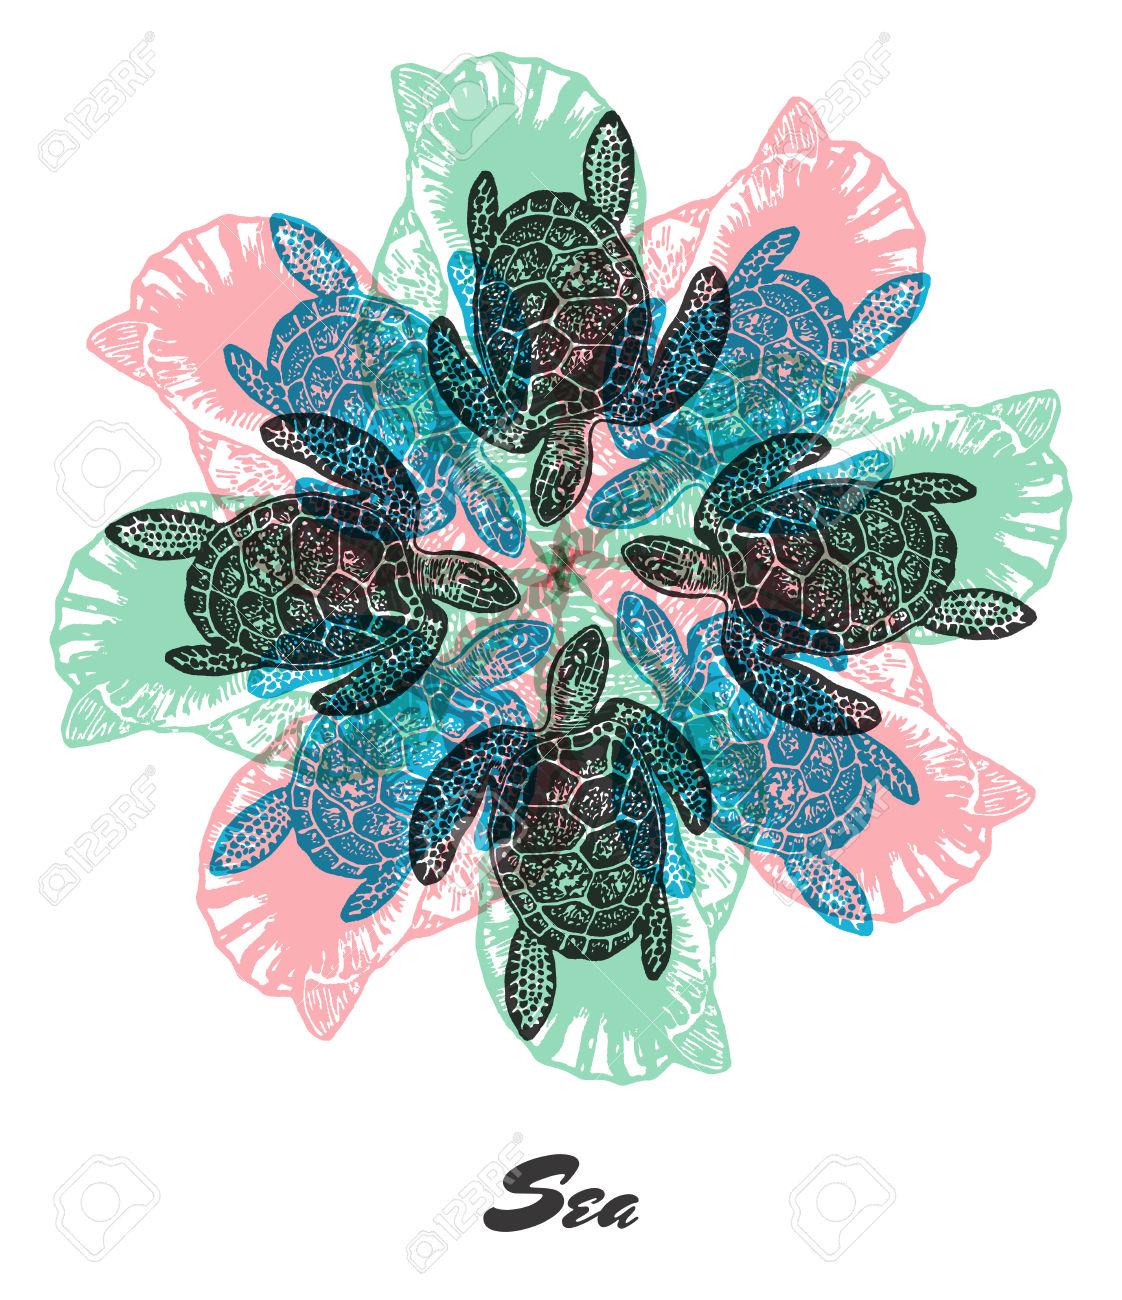 Vector Sea Mood Engraved Fractal Outlet Composition. Bright.